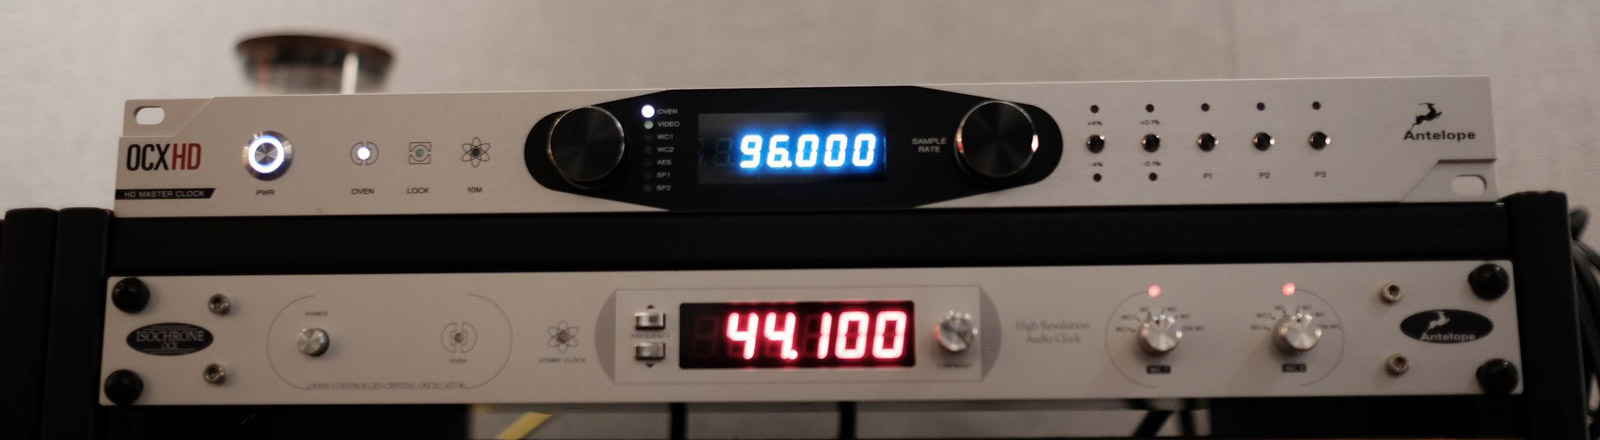 44100 vs 96000